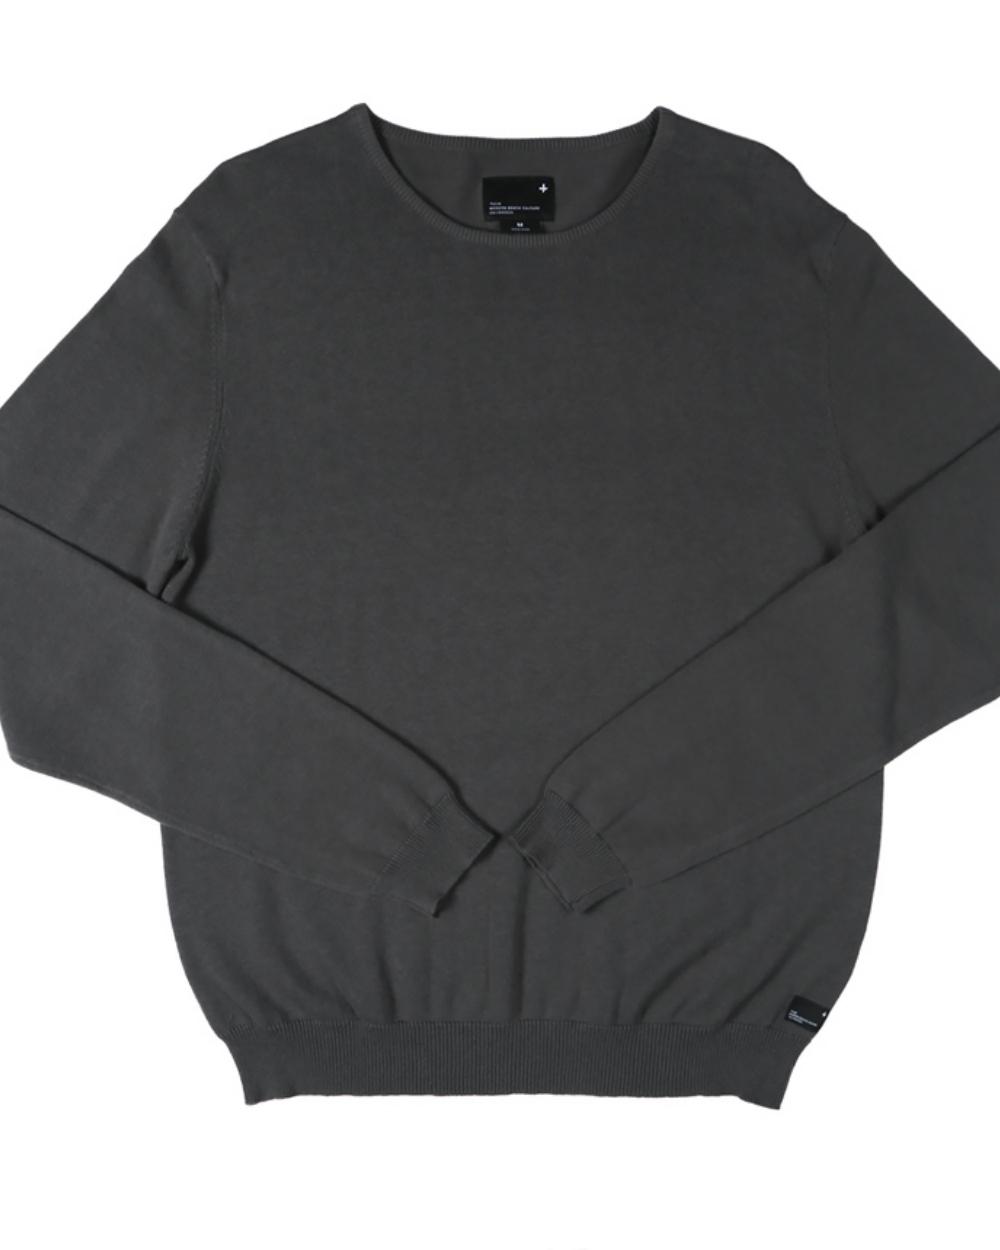 2015 Tavik Men's Grey Welcome Sweater